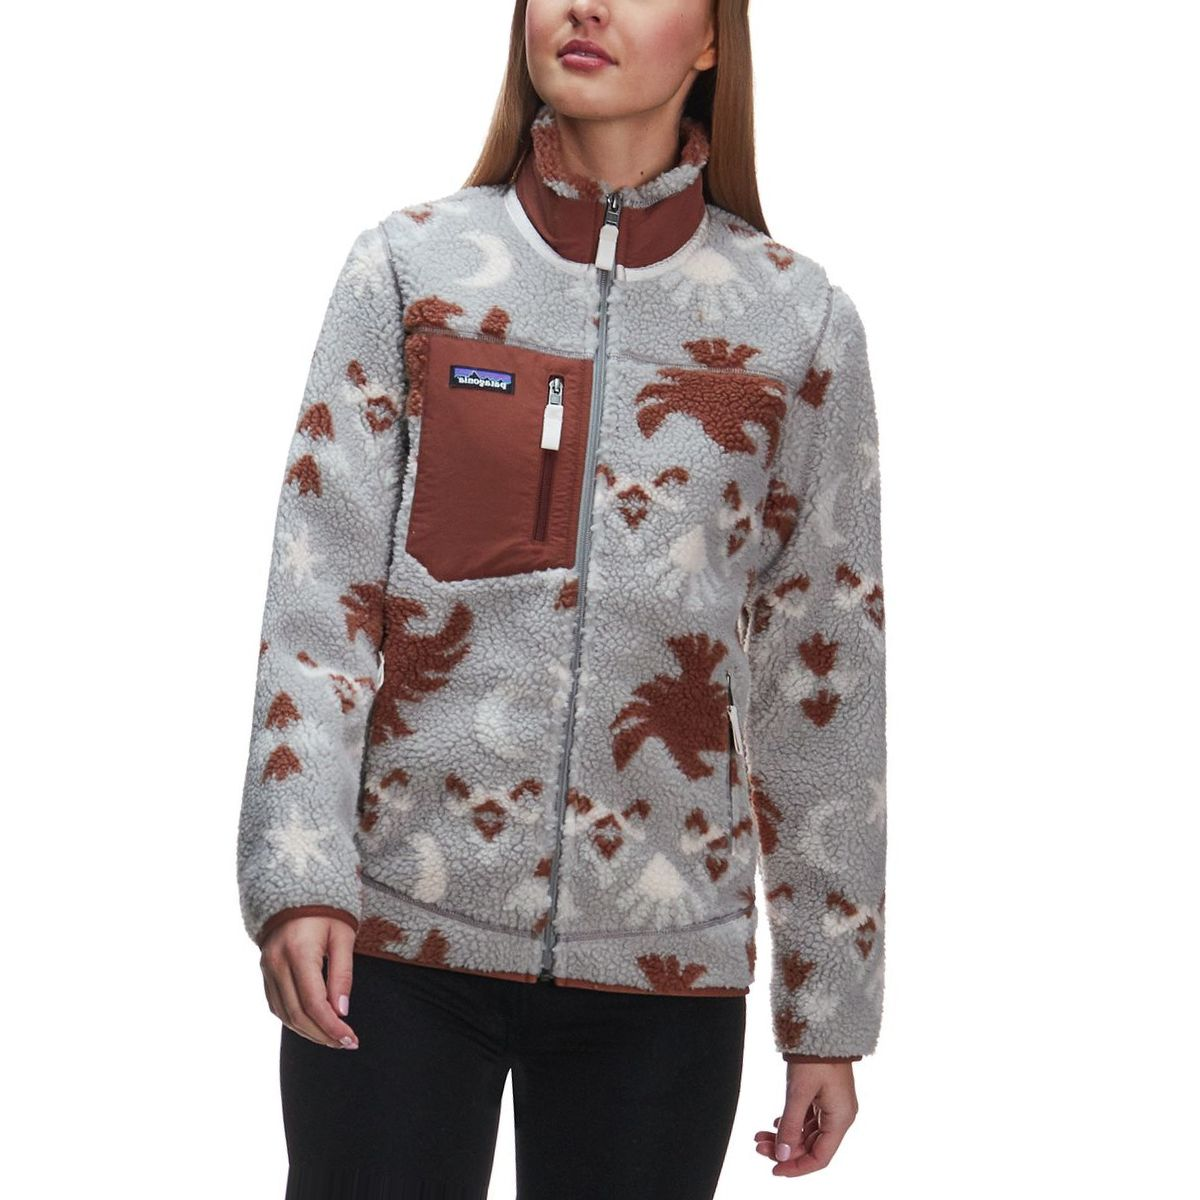 Patagonia Classic Retro-X Fleece Jacket - Women's